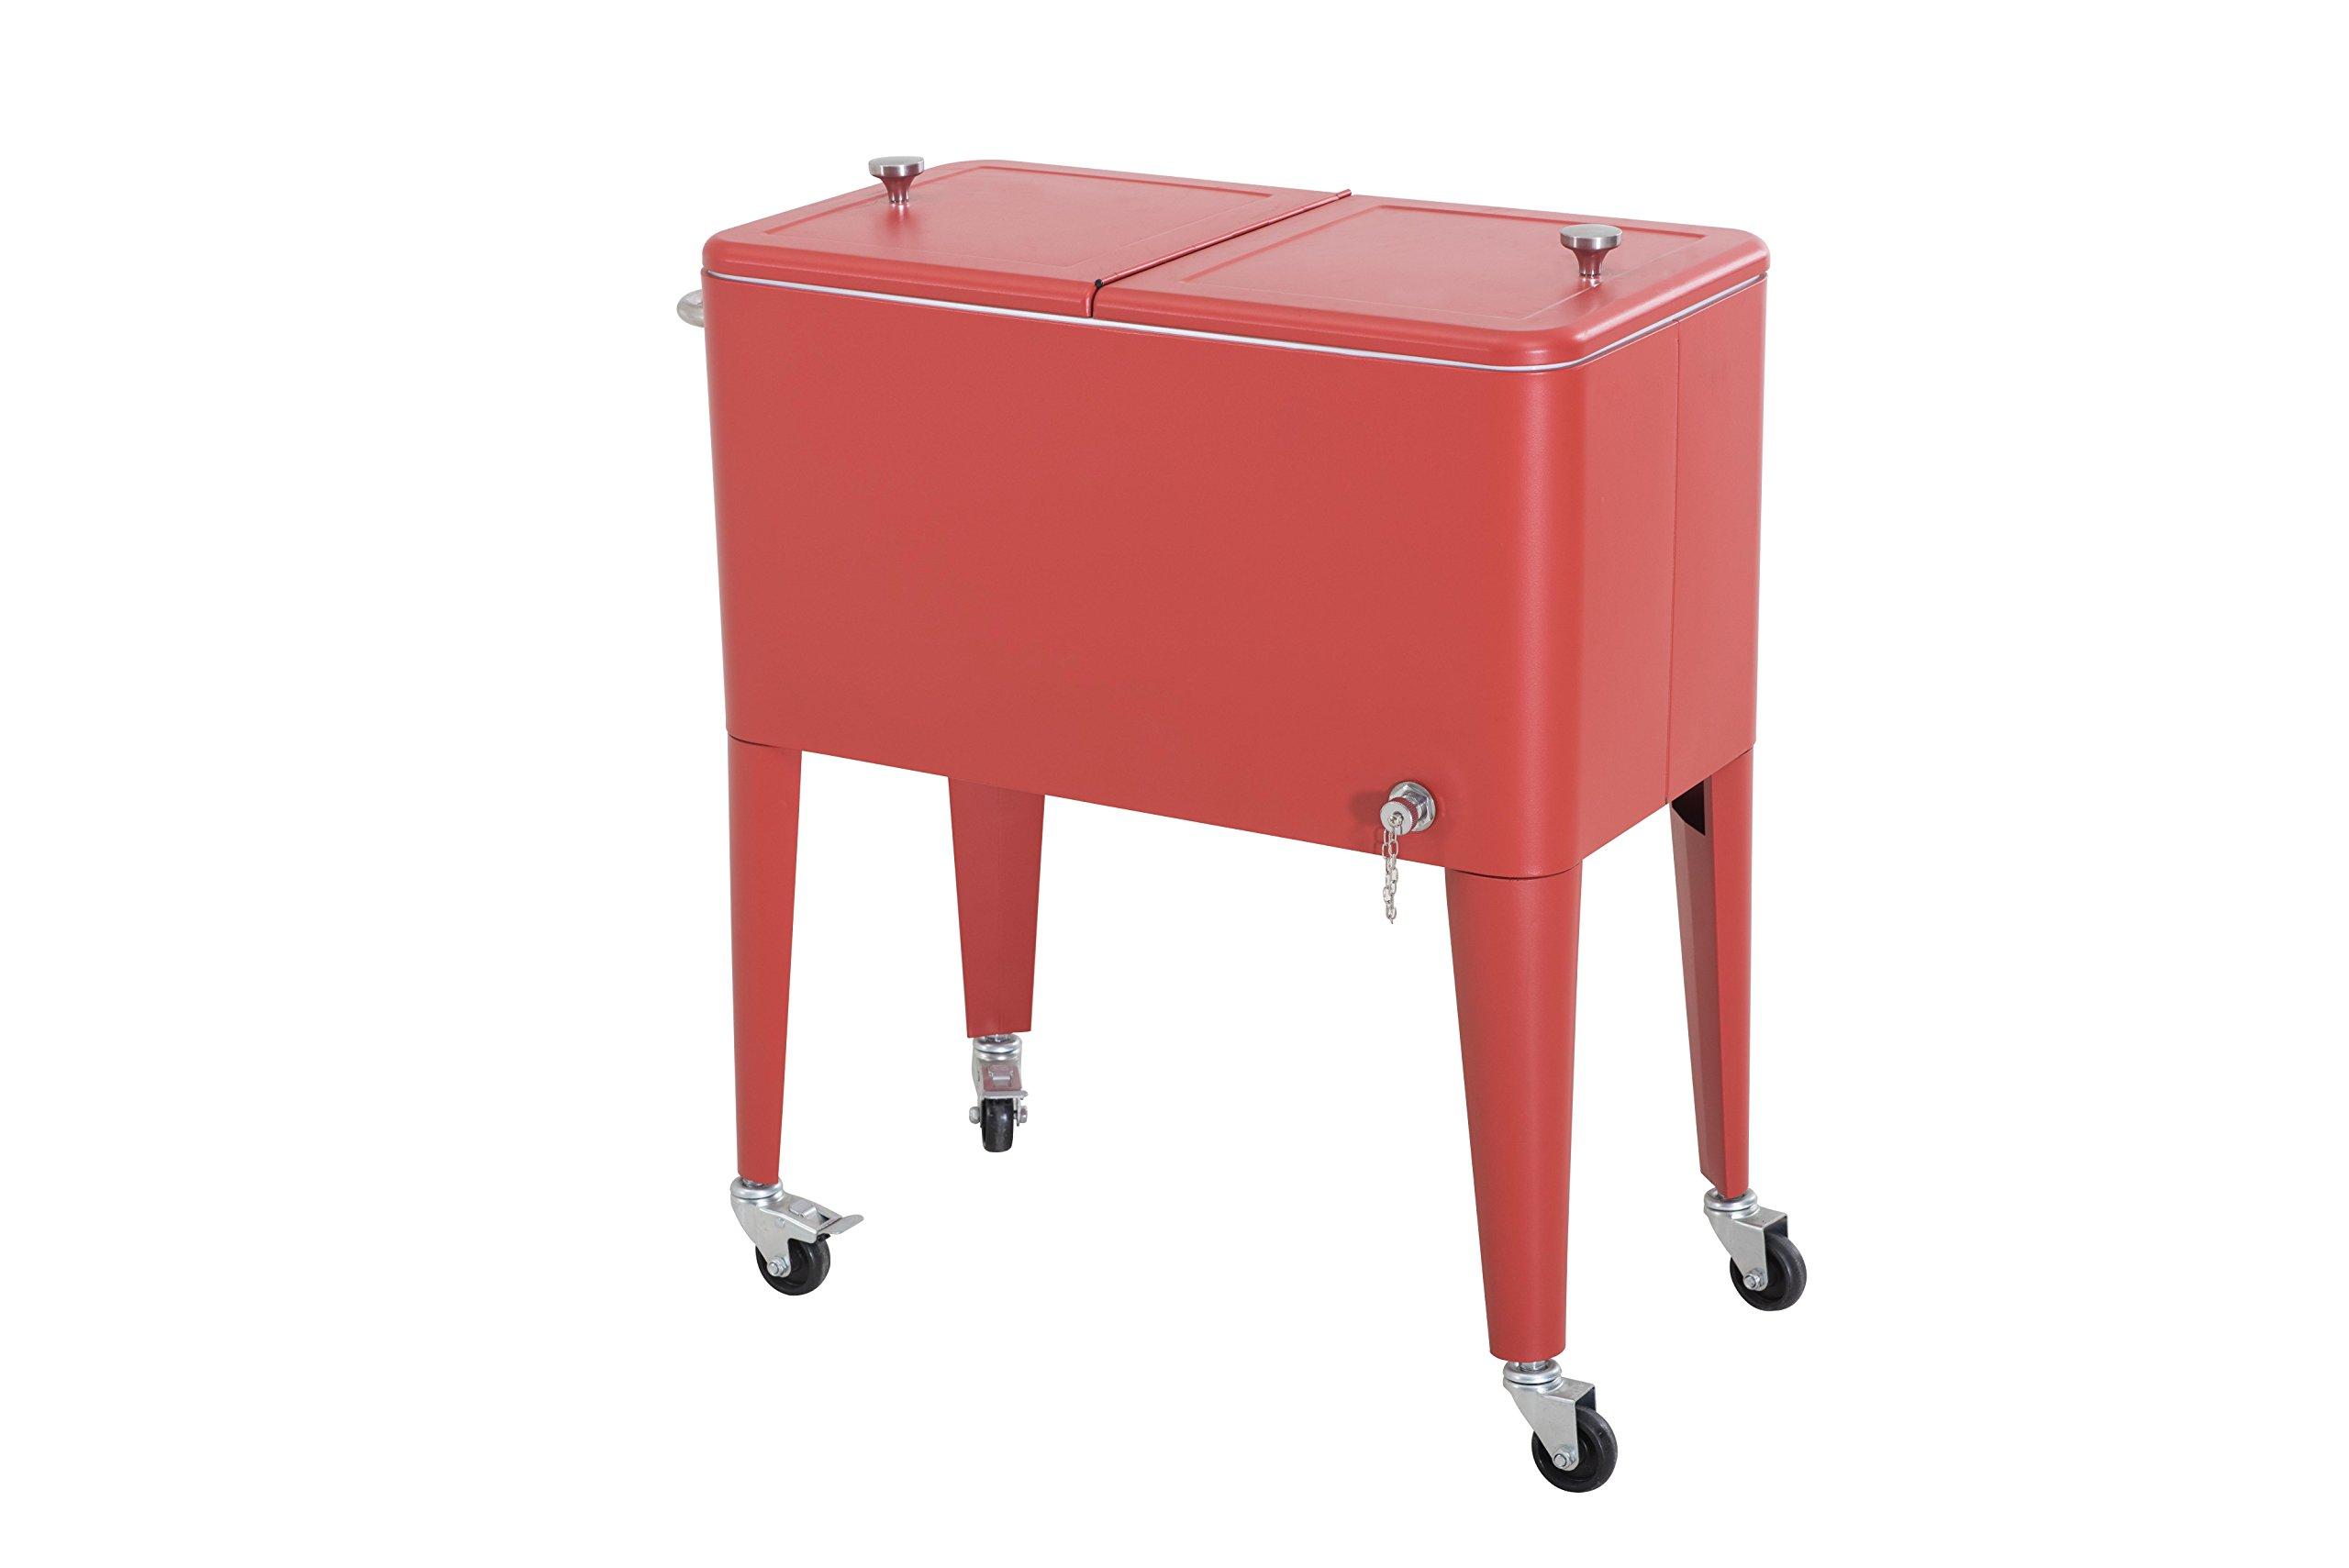 Sunjoy L-BC153PST 60 quart Wheeled Beverage Cooler in Red by sunjoy (Image #4)